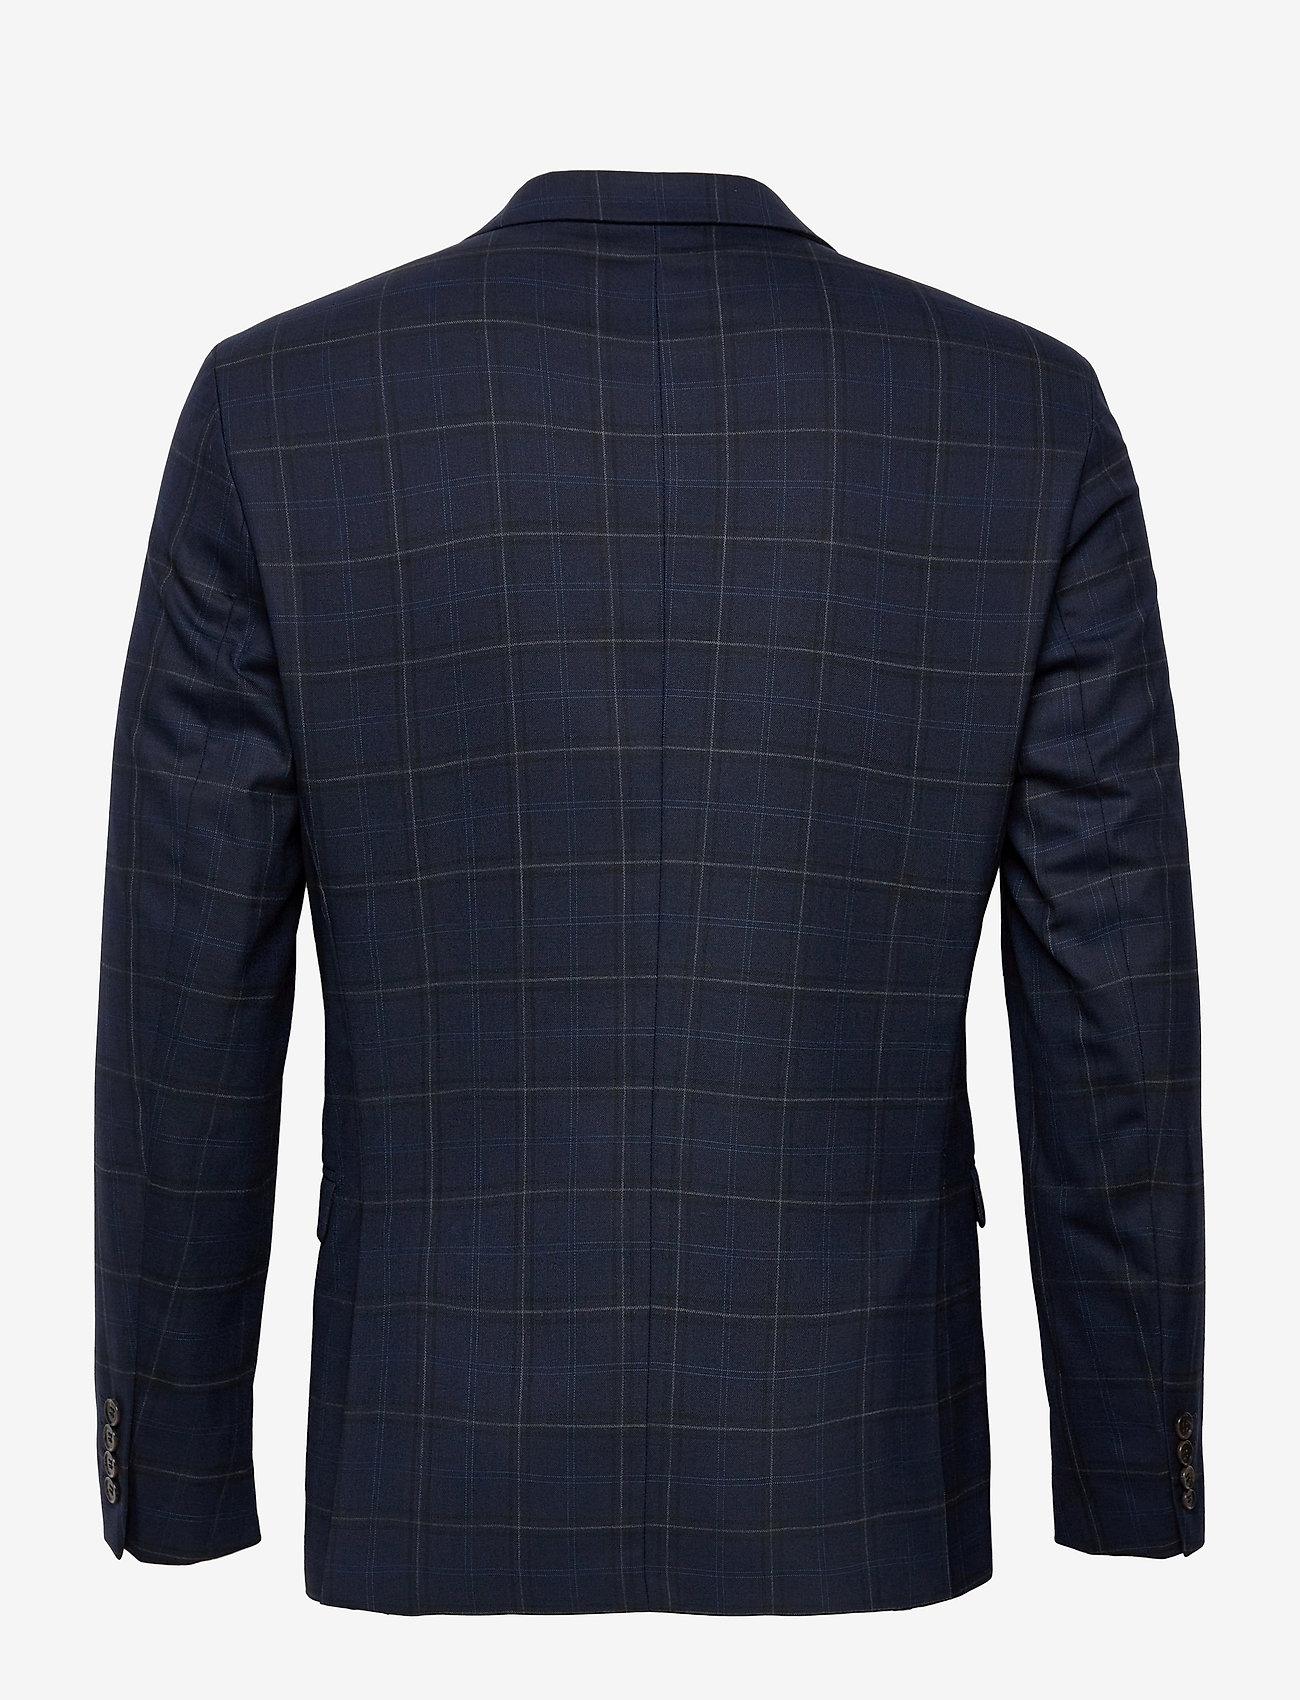 Selected Homme - SLHSLIM-MYLOBILL DK BLU GRCHK BLZ B - blazers à boutonnage simple - dark blue - 1